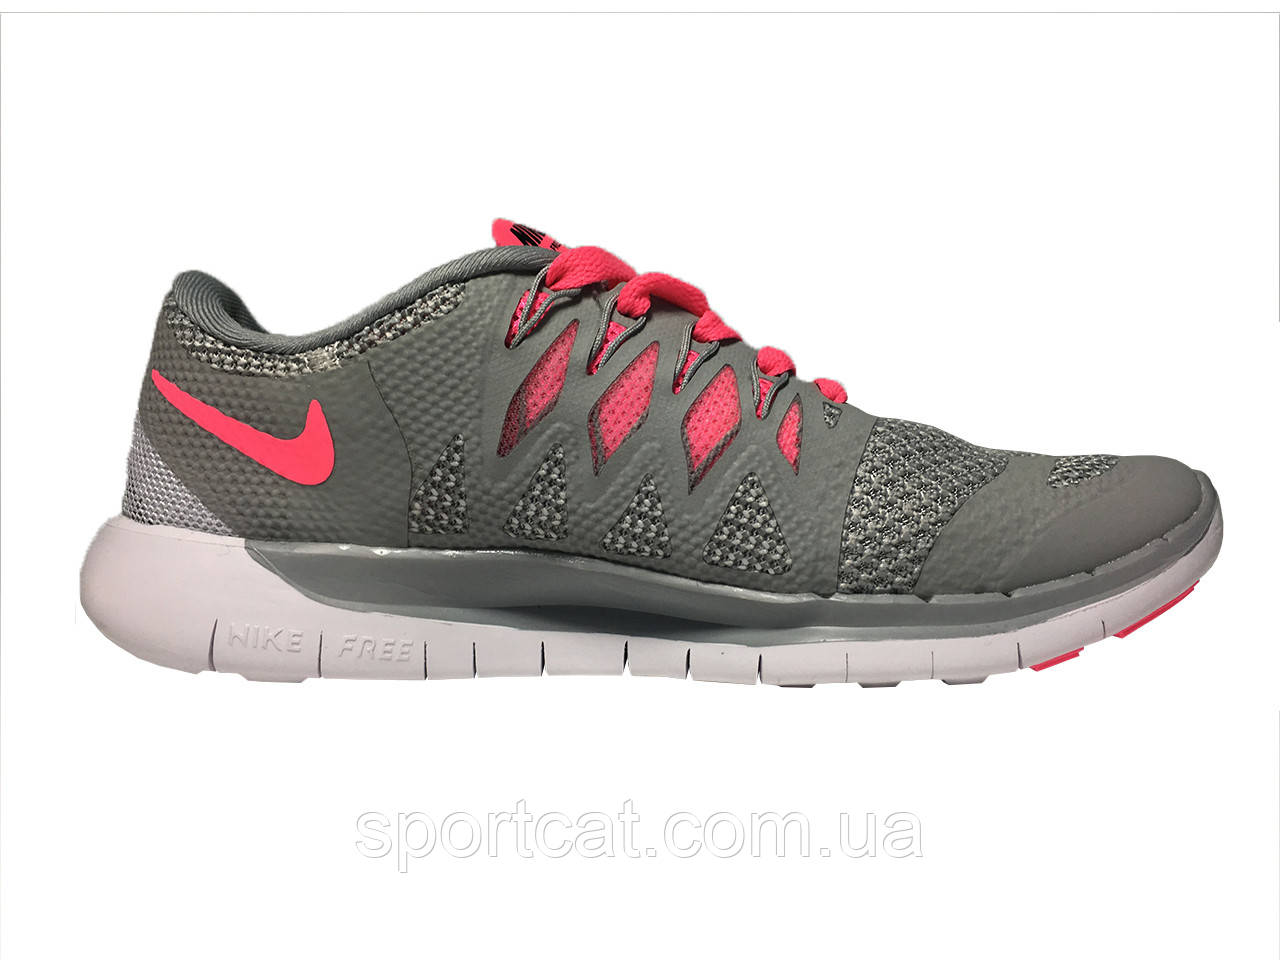 12e87f02 Женские кроссовки Nike Fre Run 5.0, Р. 37 40 - Интернет-магазин